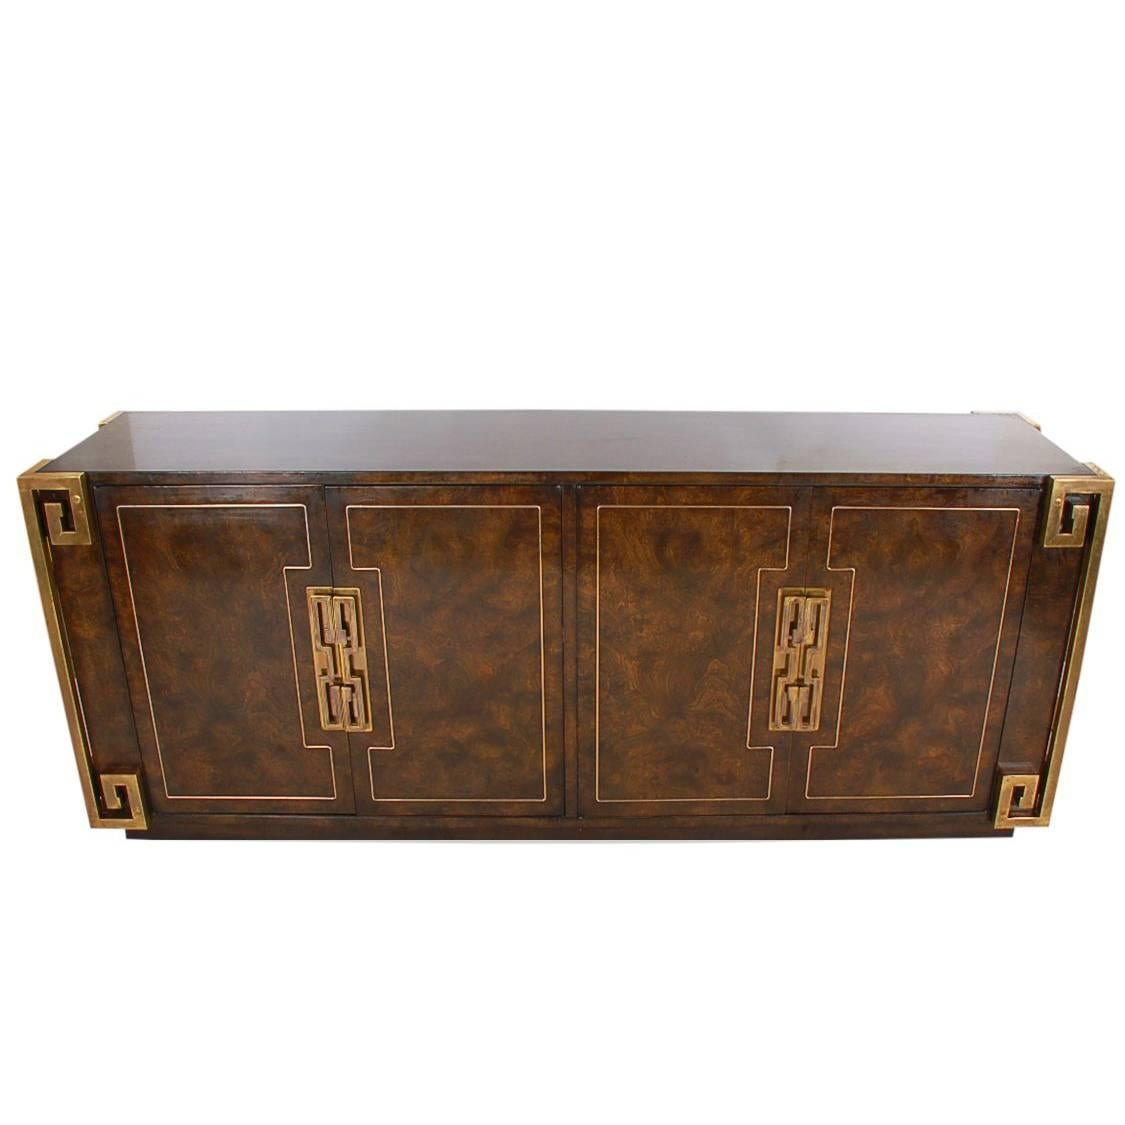 Mastercraft Hollywood Regency Chinoiserie Brass & Burled Elm Credenza or Dresser